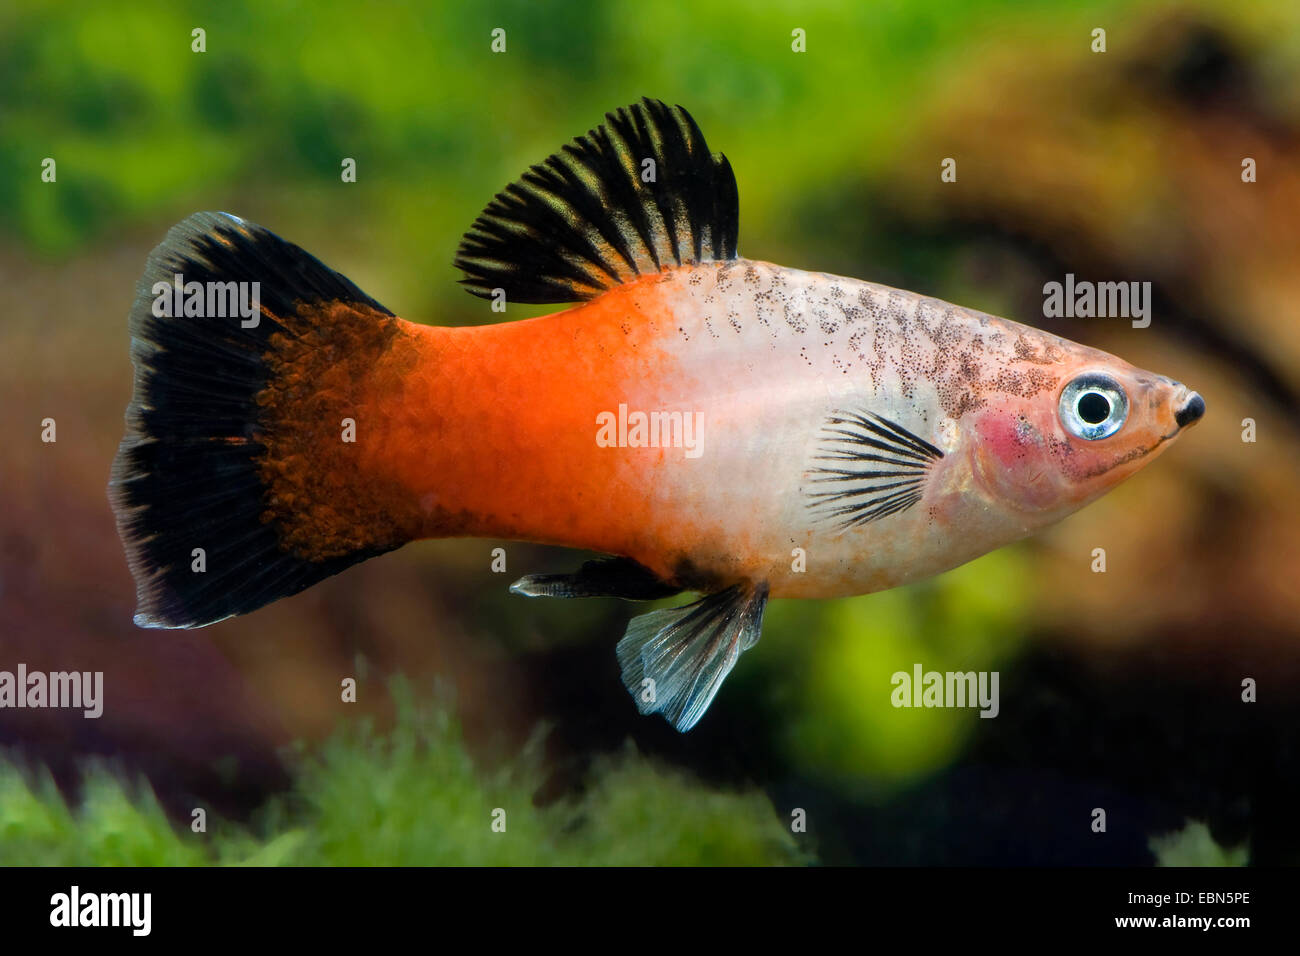 southern platyfish, Maculate Platy (Xiphophorus maculatus), breed Showa Tricolor - Stock Image